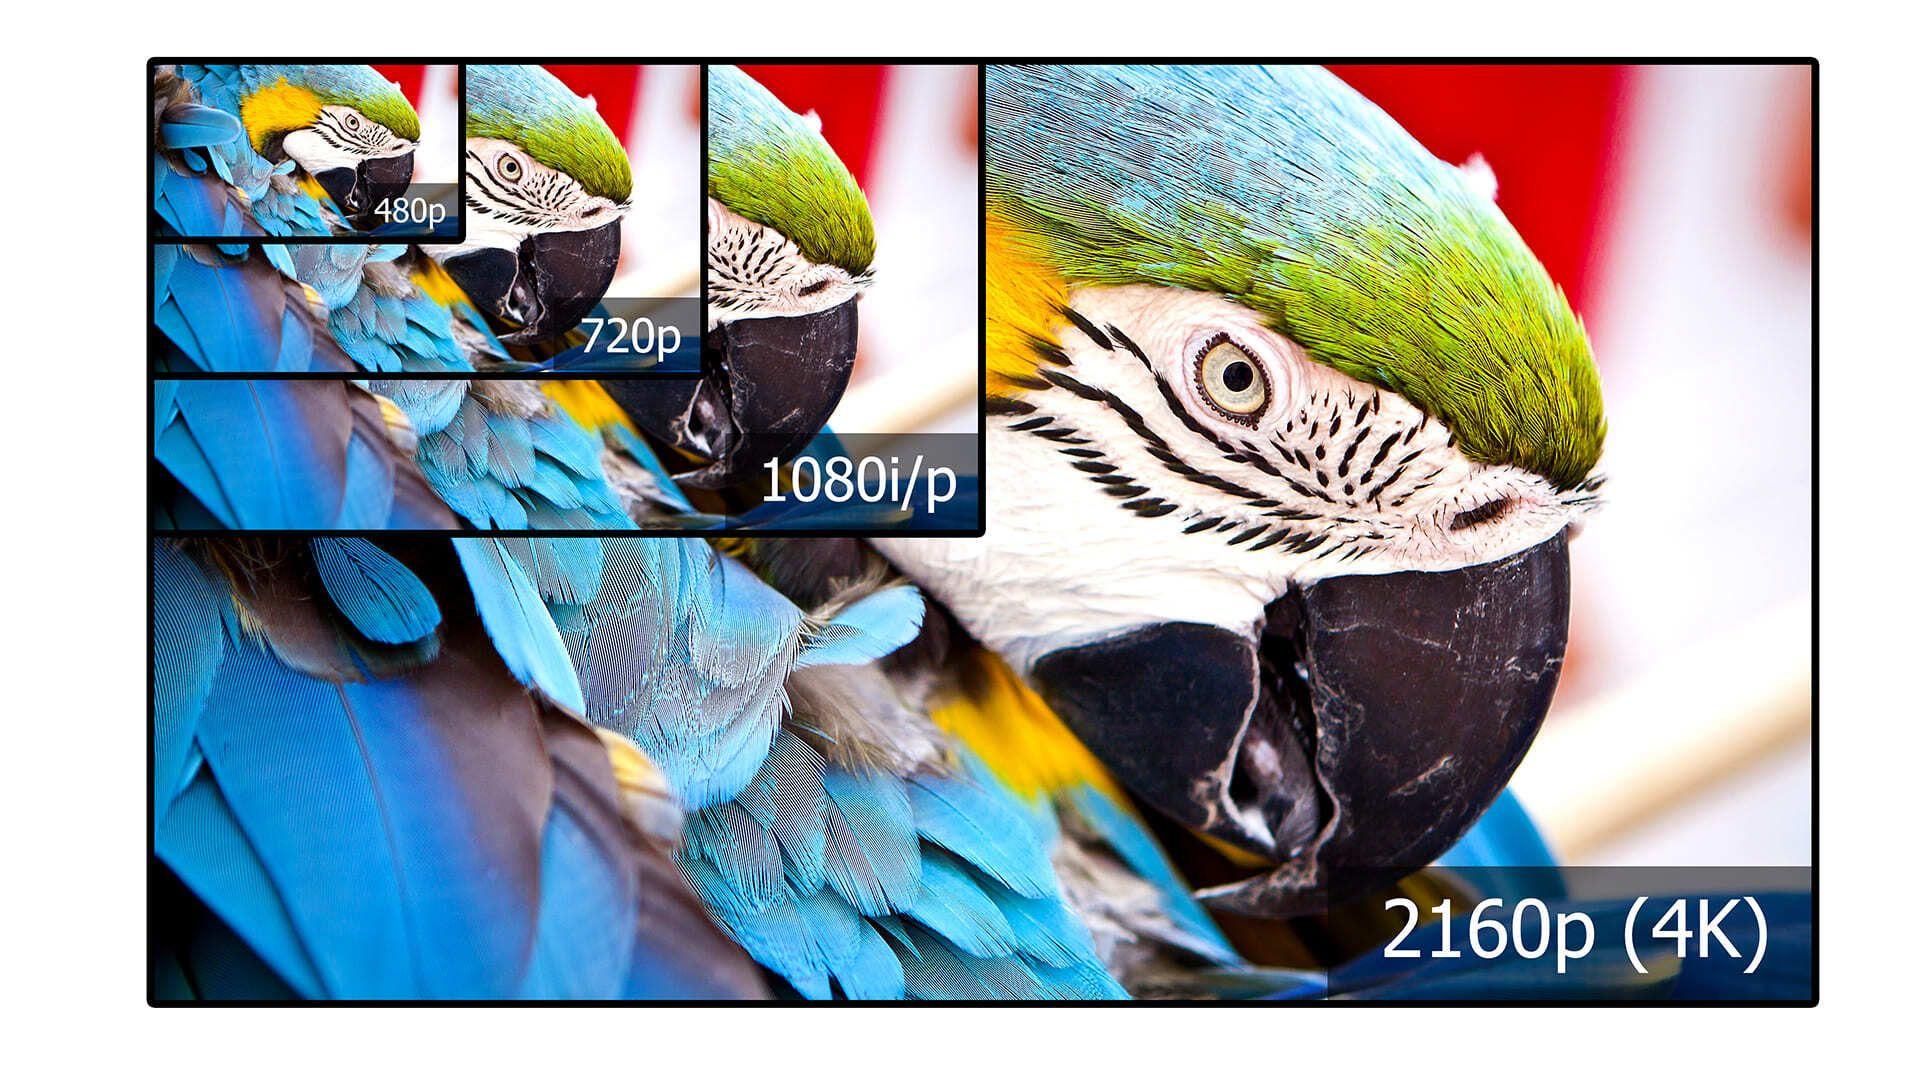 Conheça as melhores Smart TVs Samsung 4K e Full HD (Imagem: Shutterstock)